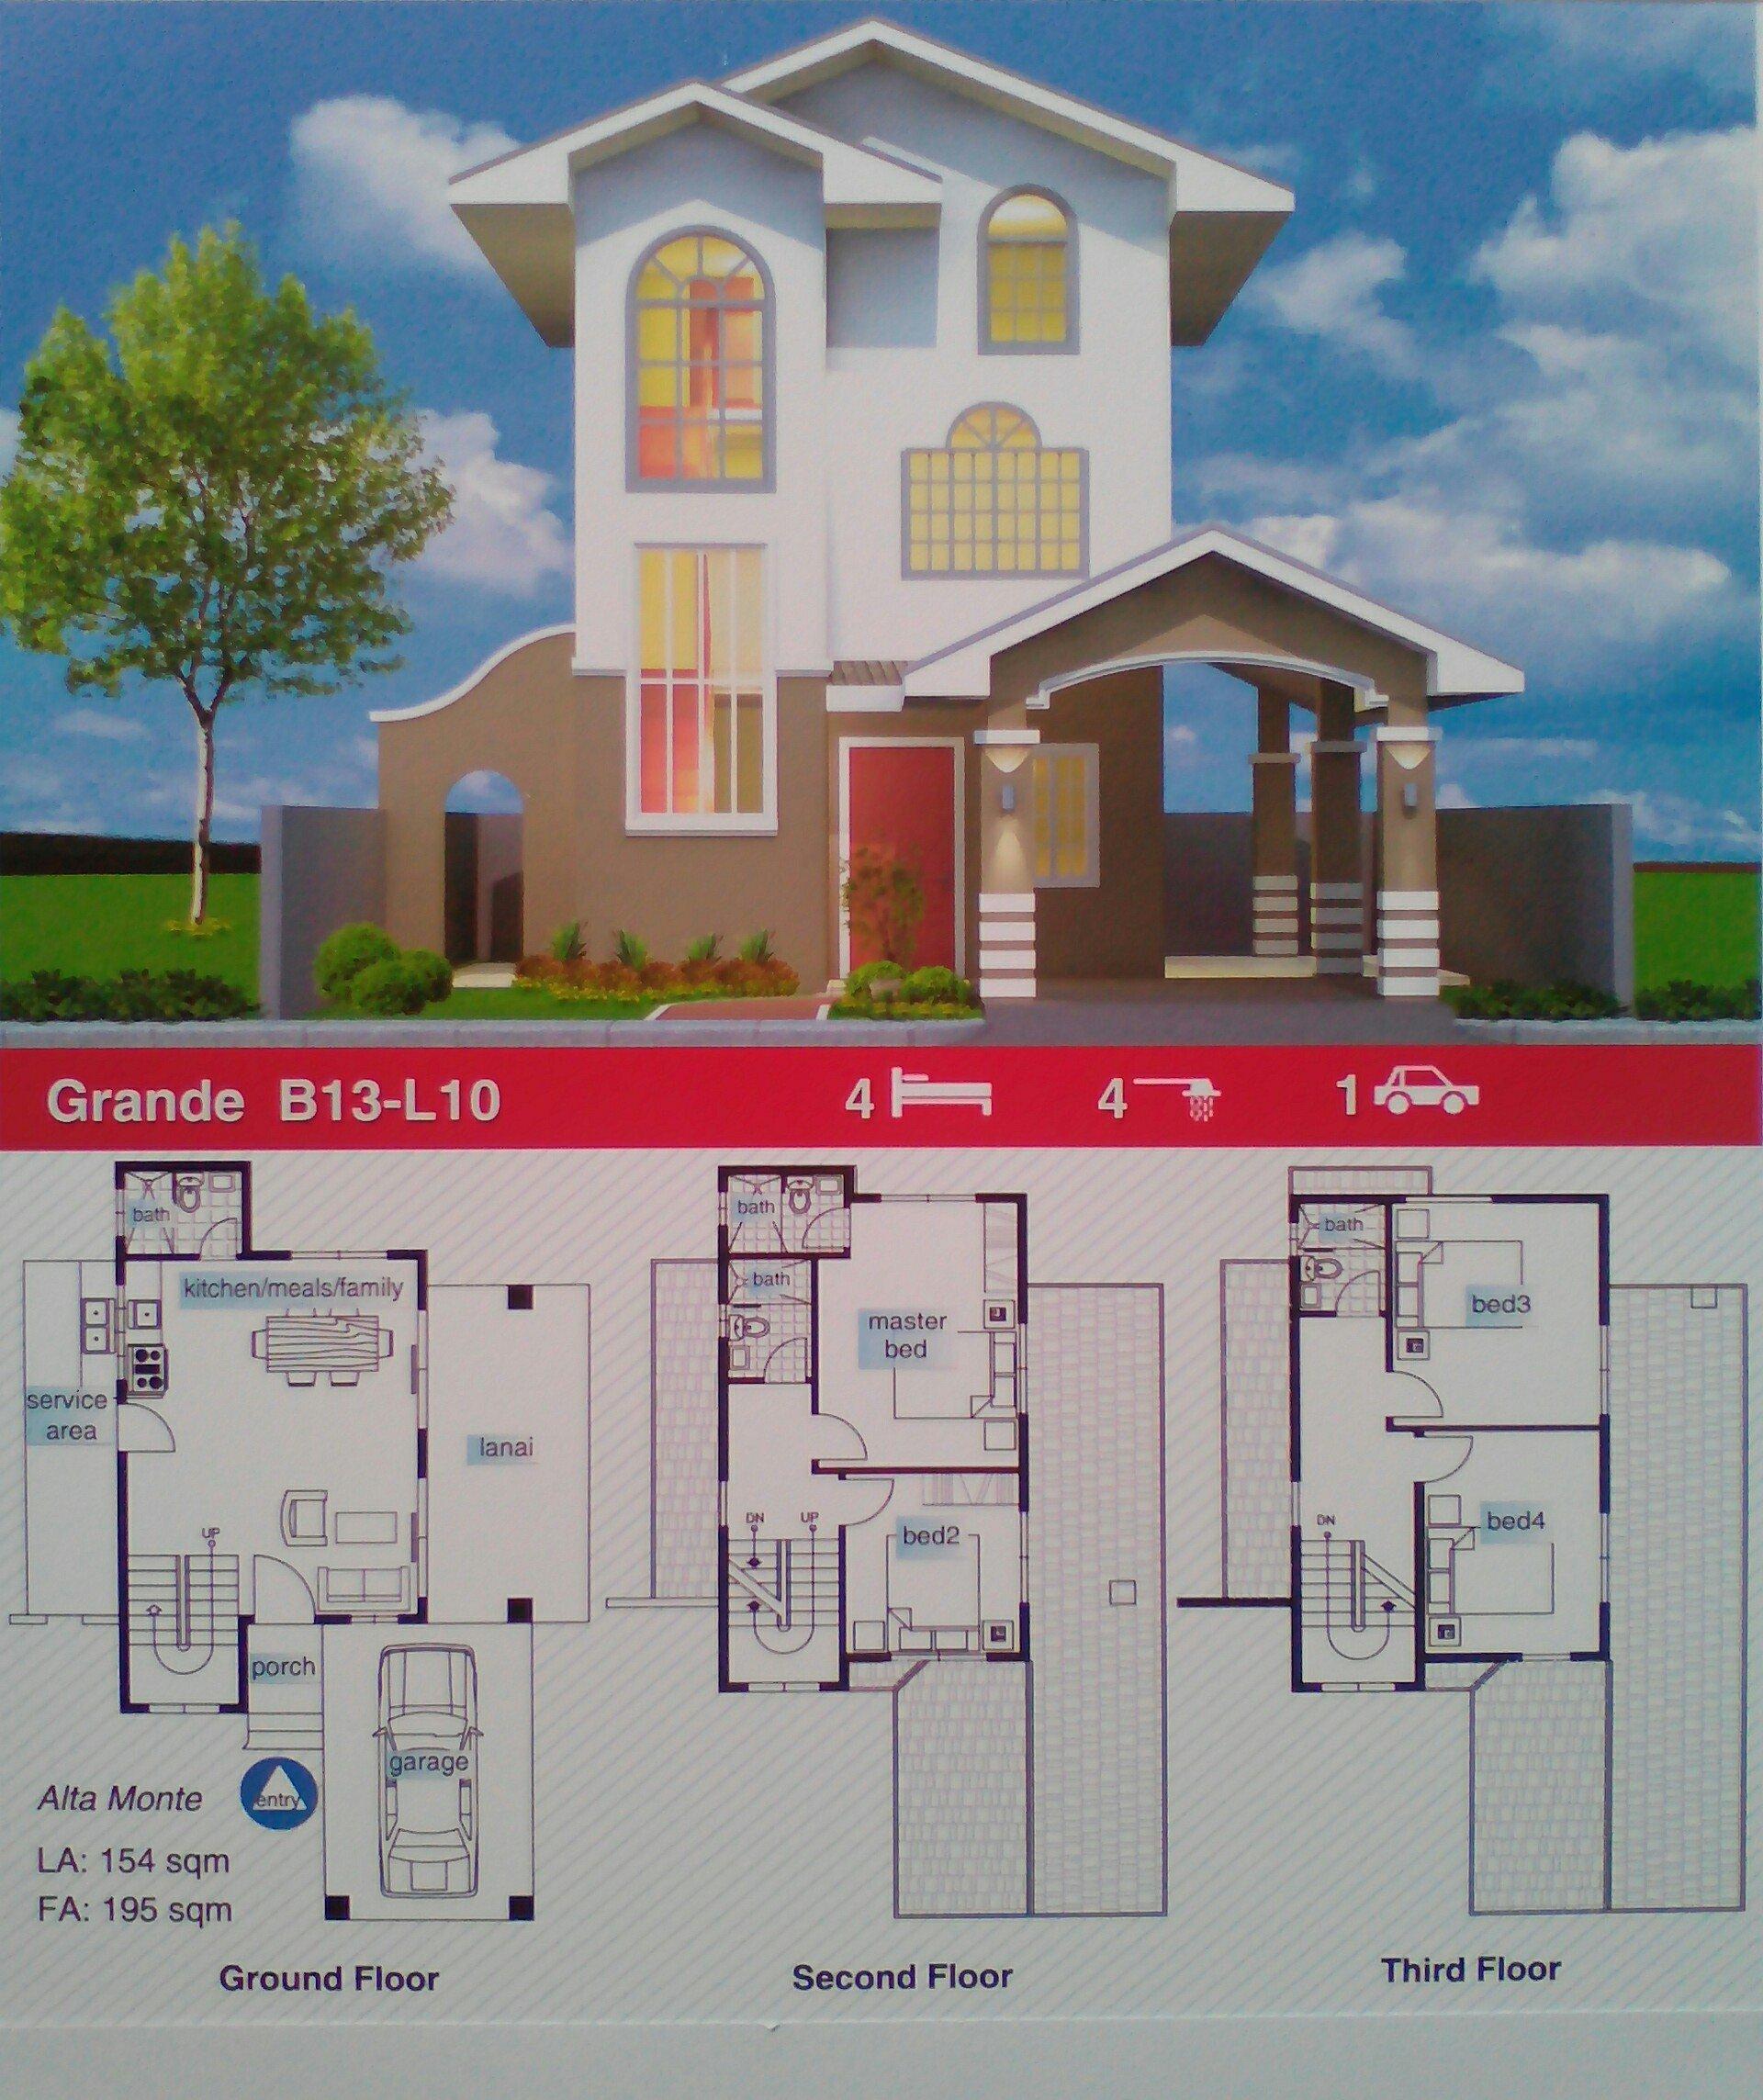 Alta Monte Tagaytay - Floor Plan